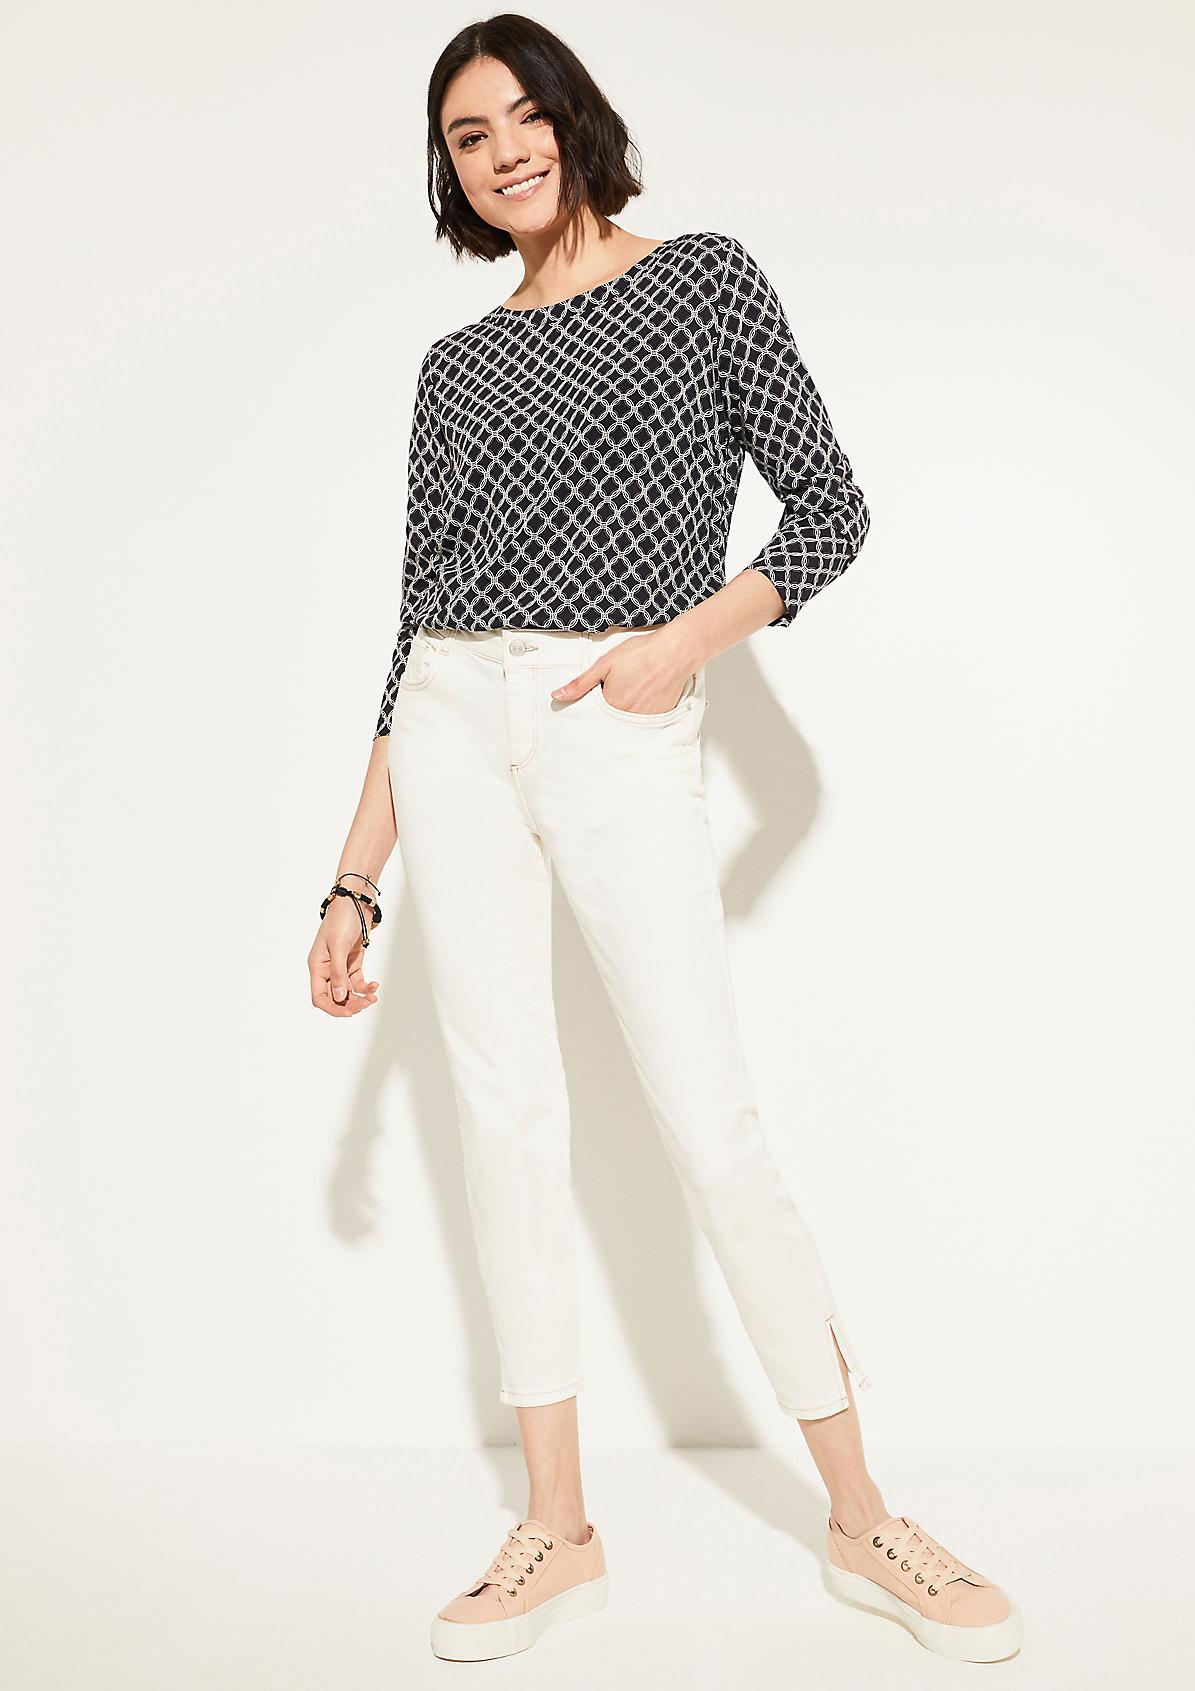 Bluse mit ornamentalem Allover-Print